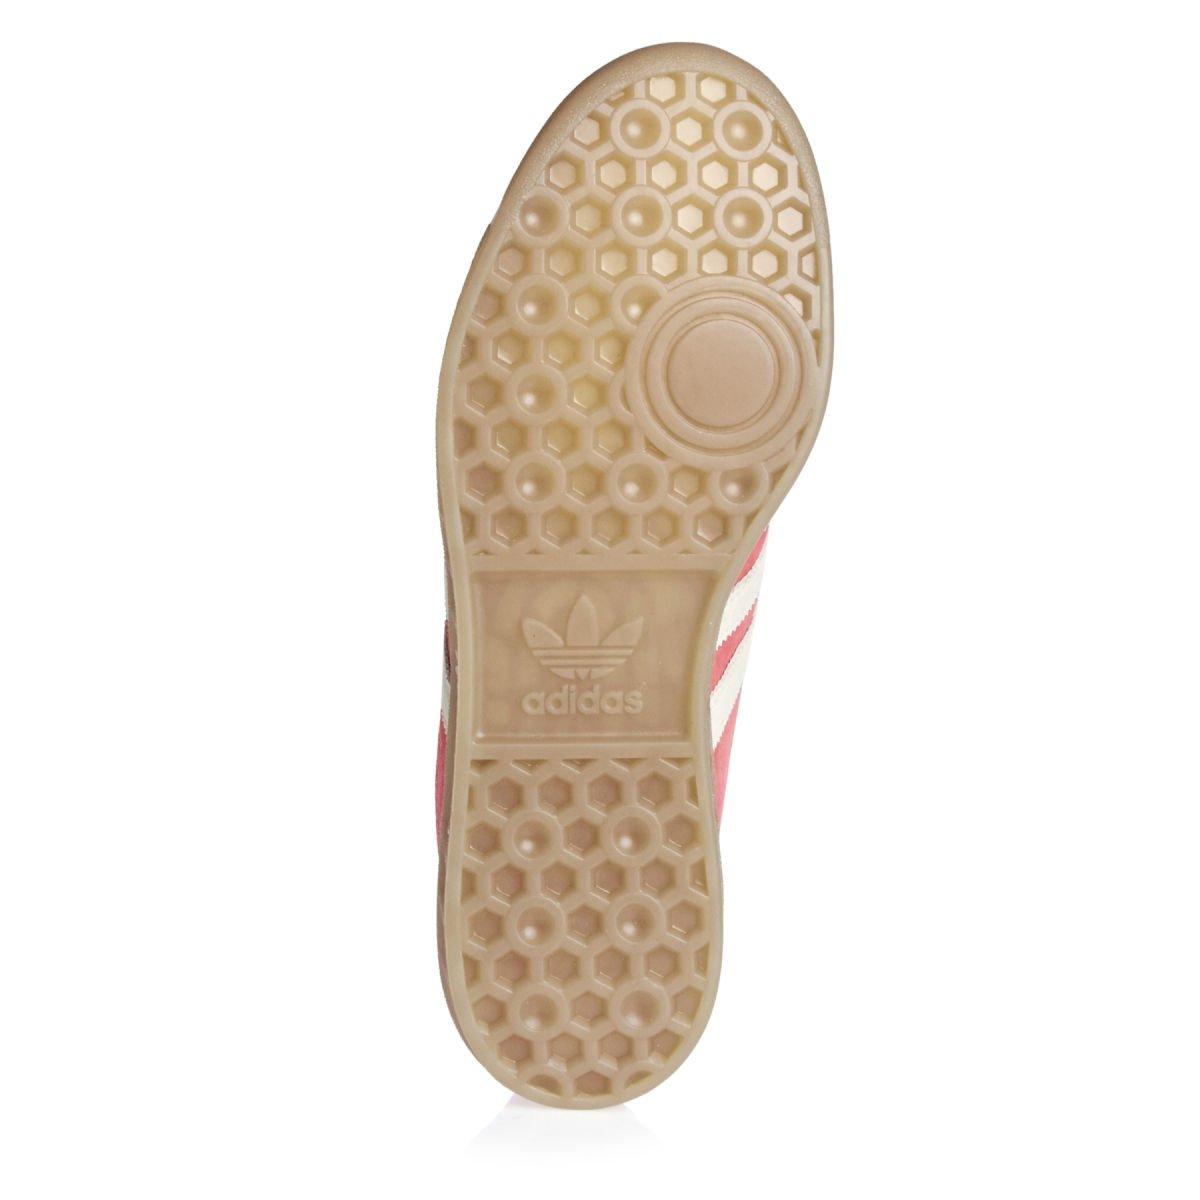 adidas Originals Hamburg Schuhe Sneaker Turnschuhe Rosa S74834, Größenauswahl:42